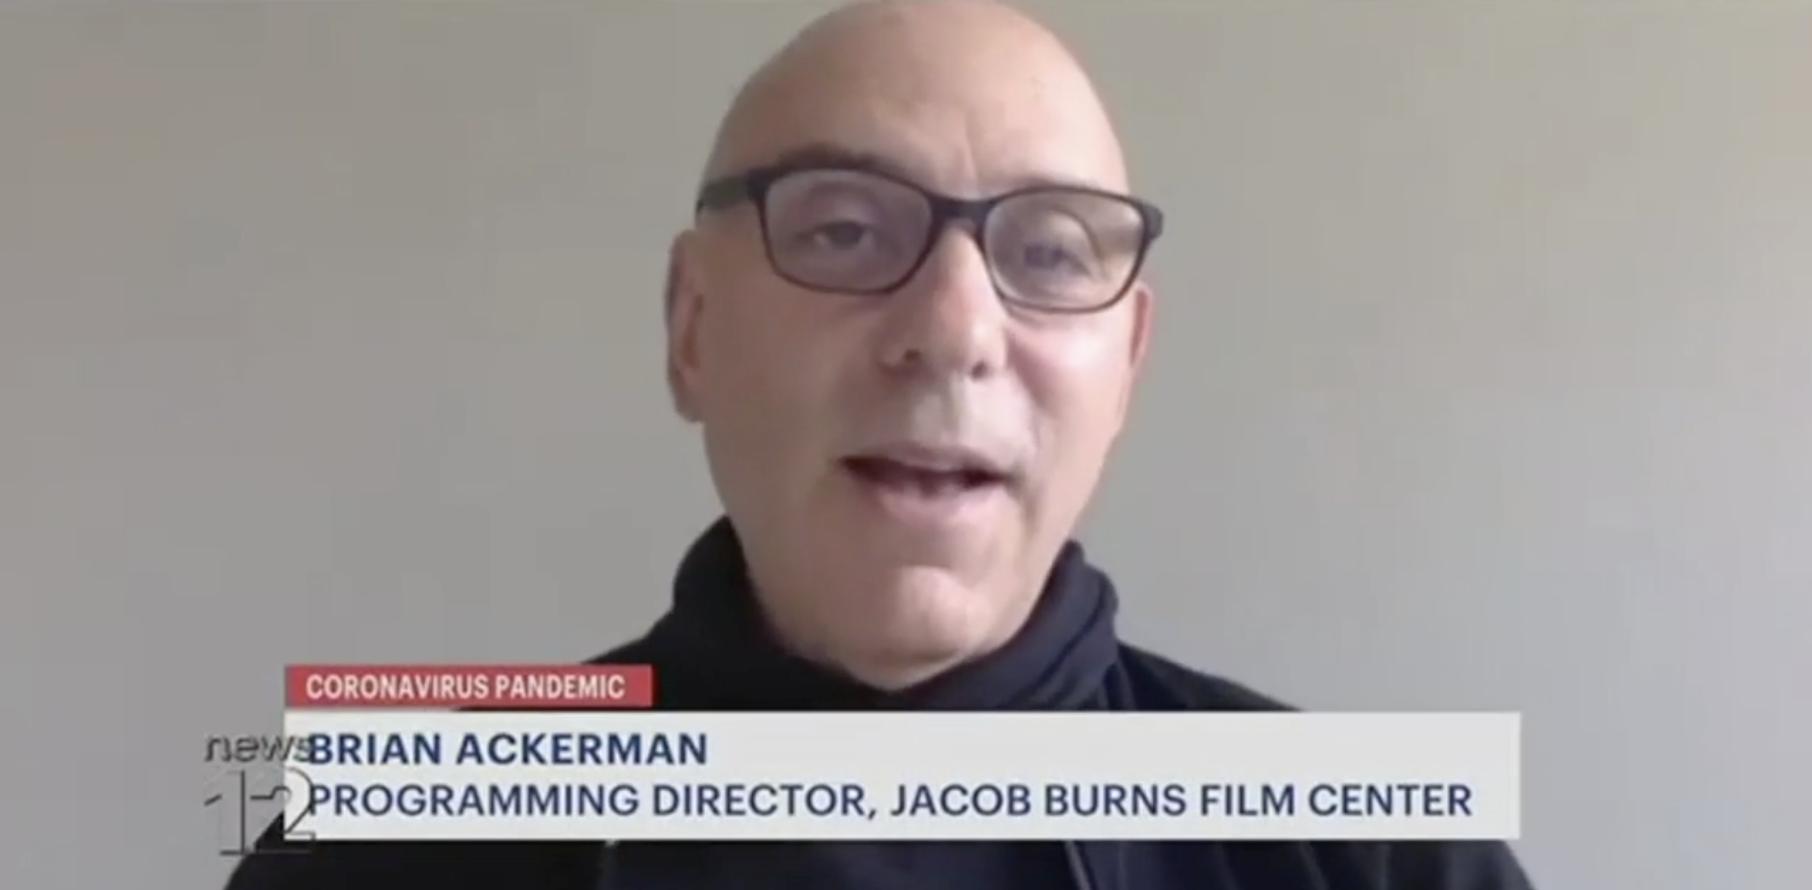 JBFC Founding Director of Film Programming Brian Ackerman on News 12